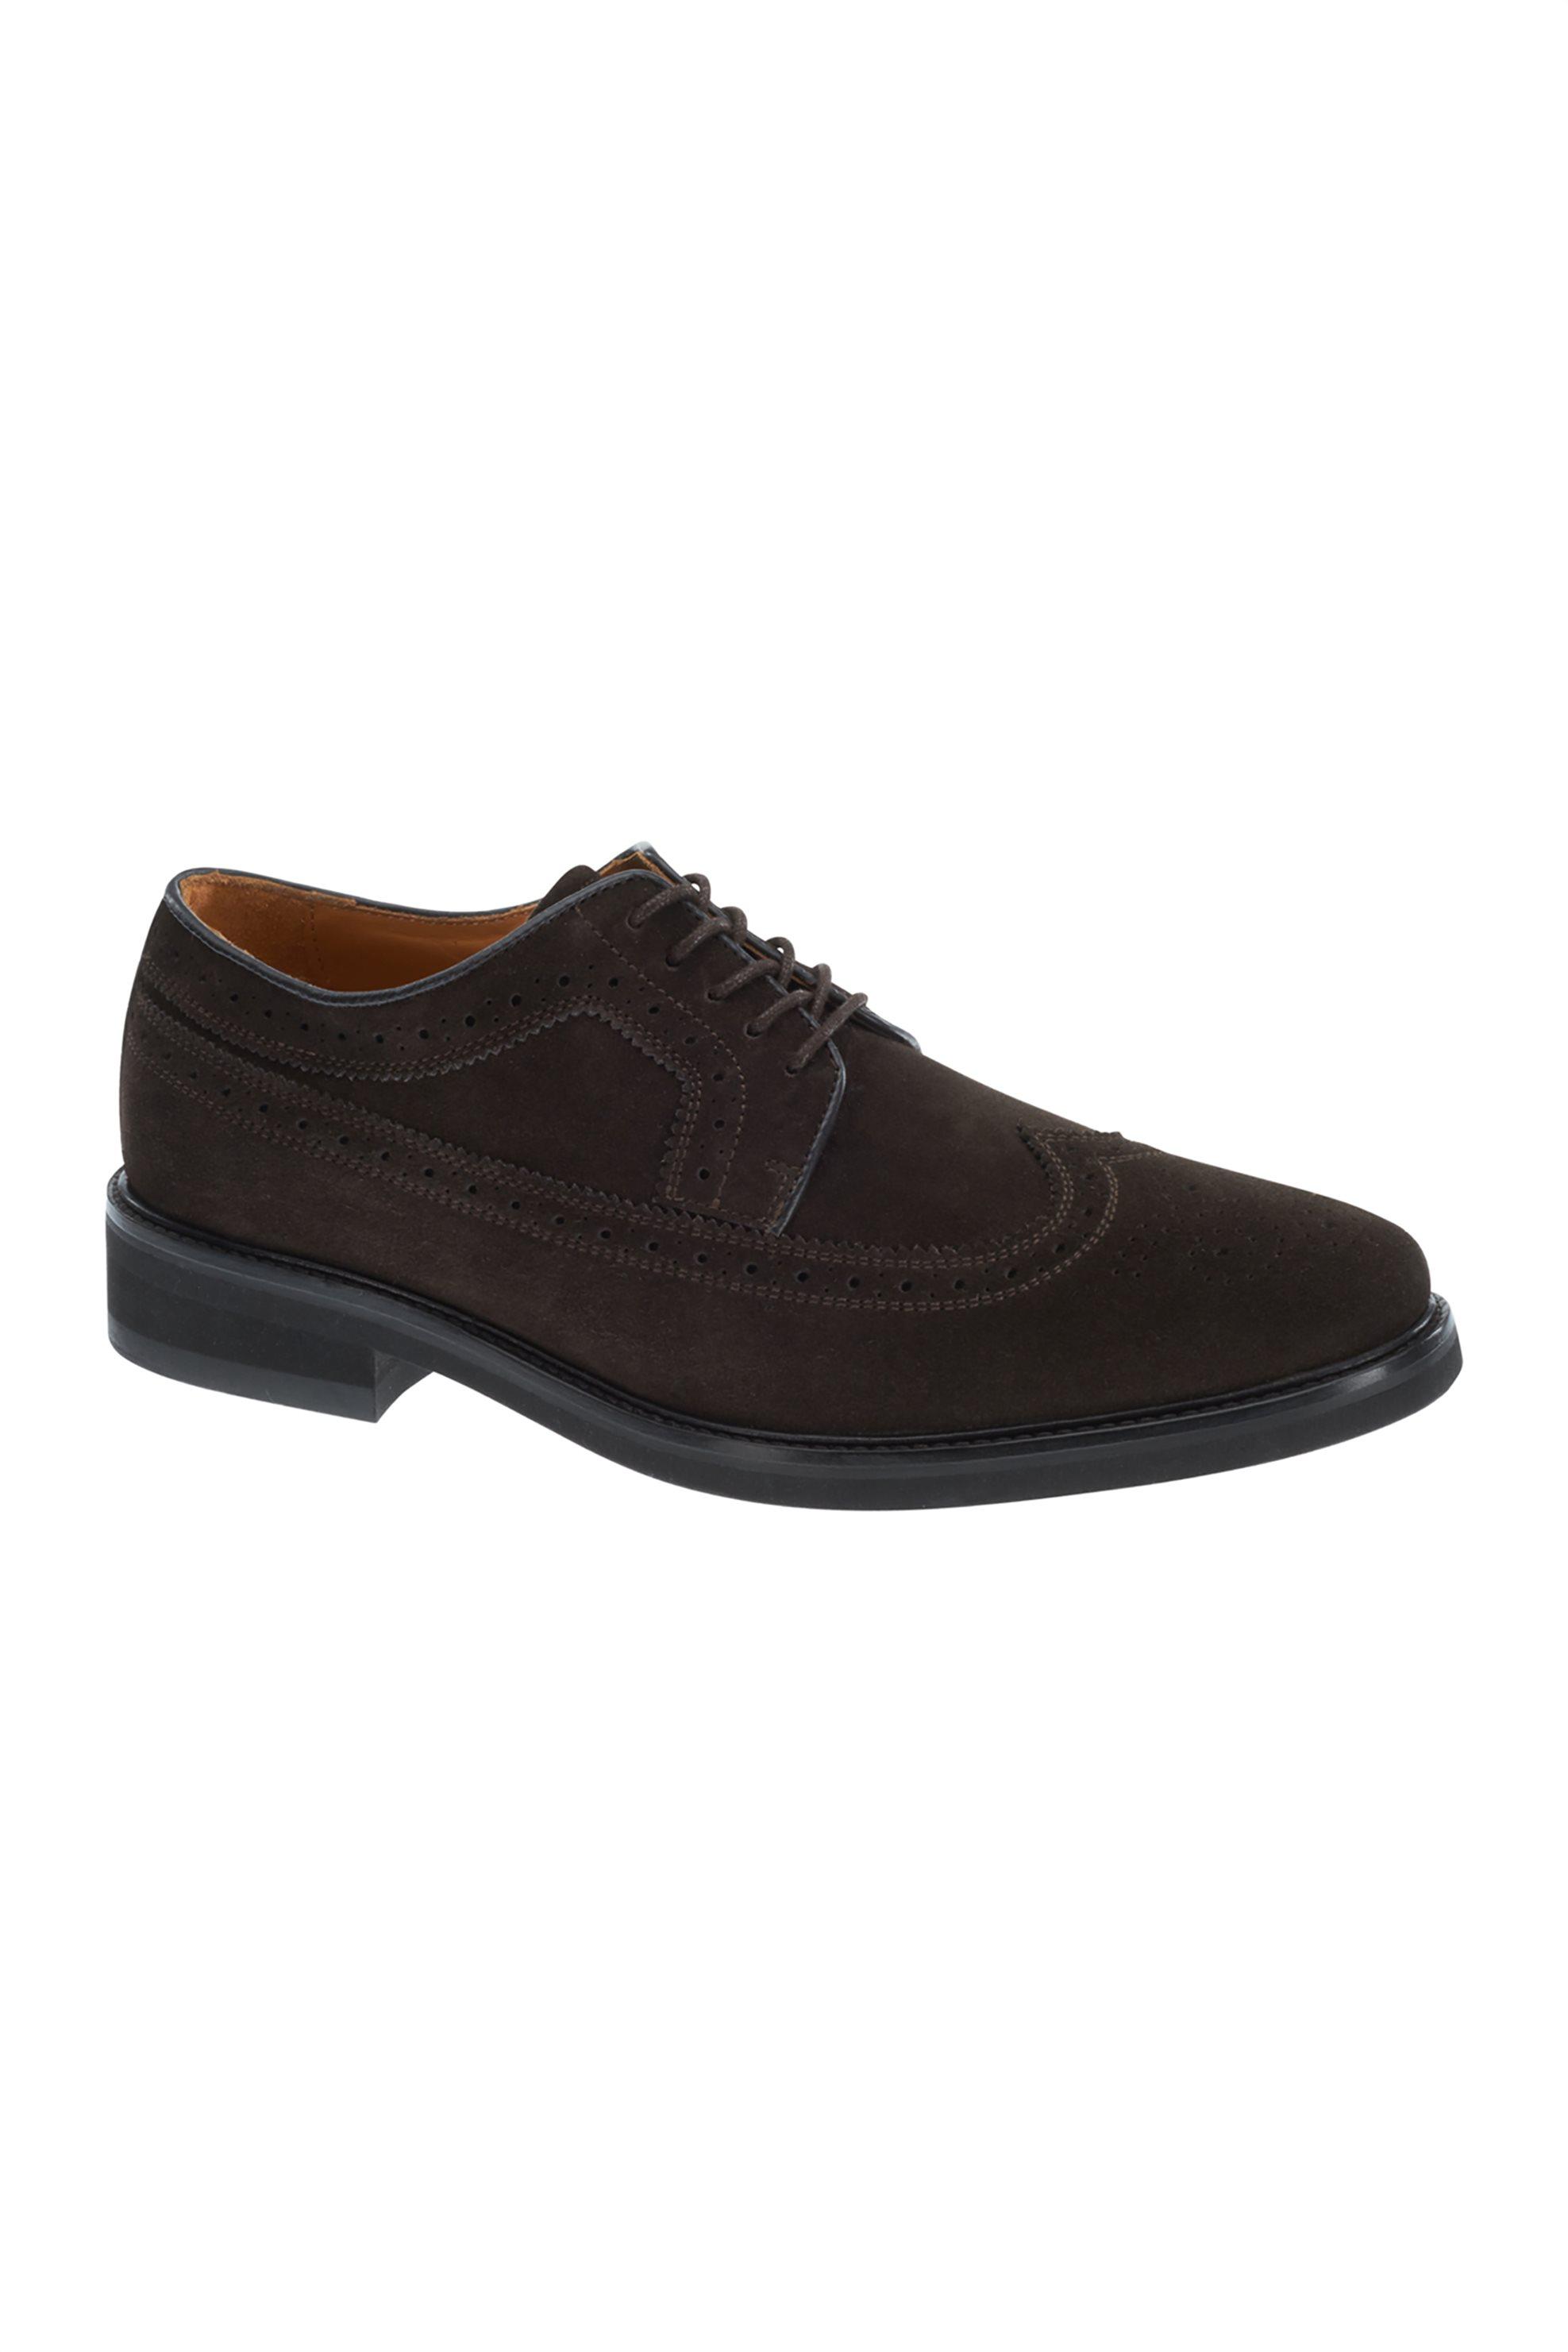 Notos Sebago ανδρικά Oxford παπούτσια Cuenca suede – L70012H0-901 – Καφέ a644bfb1c81